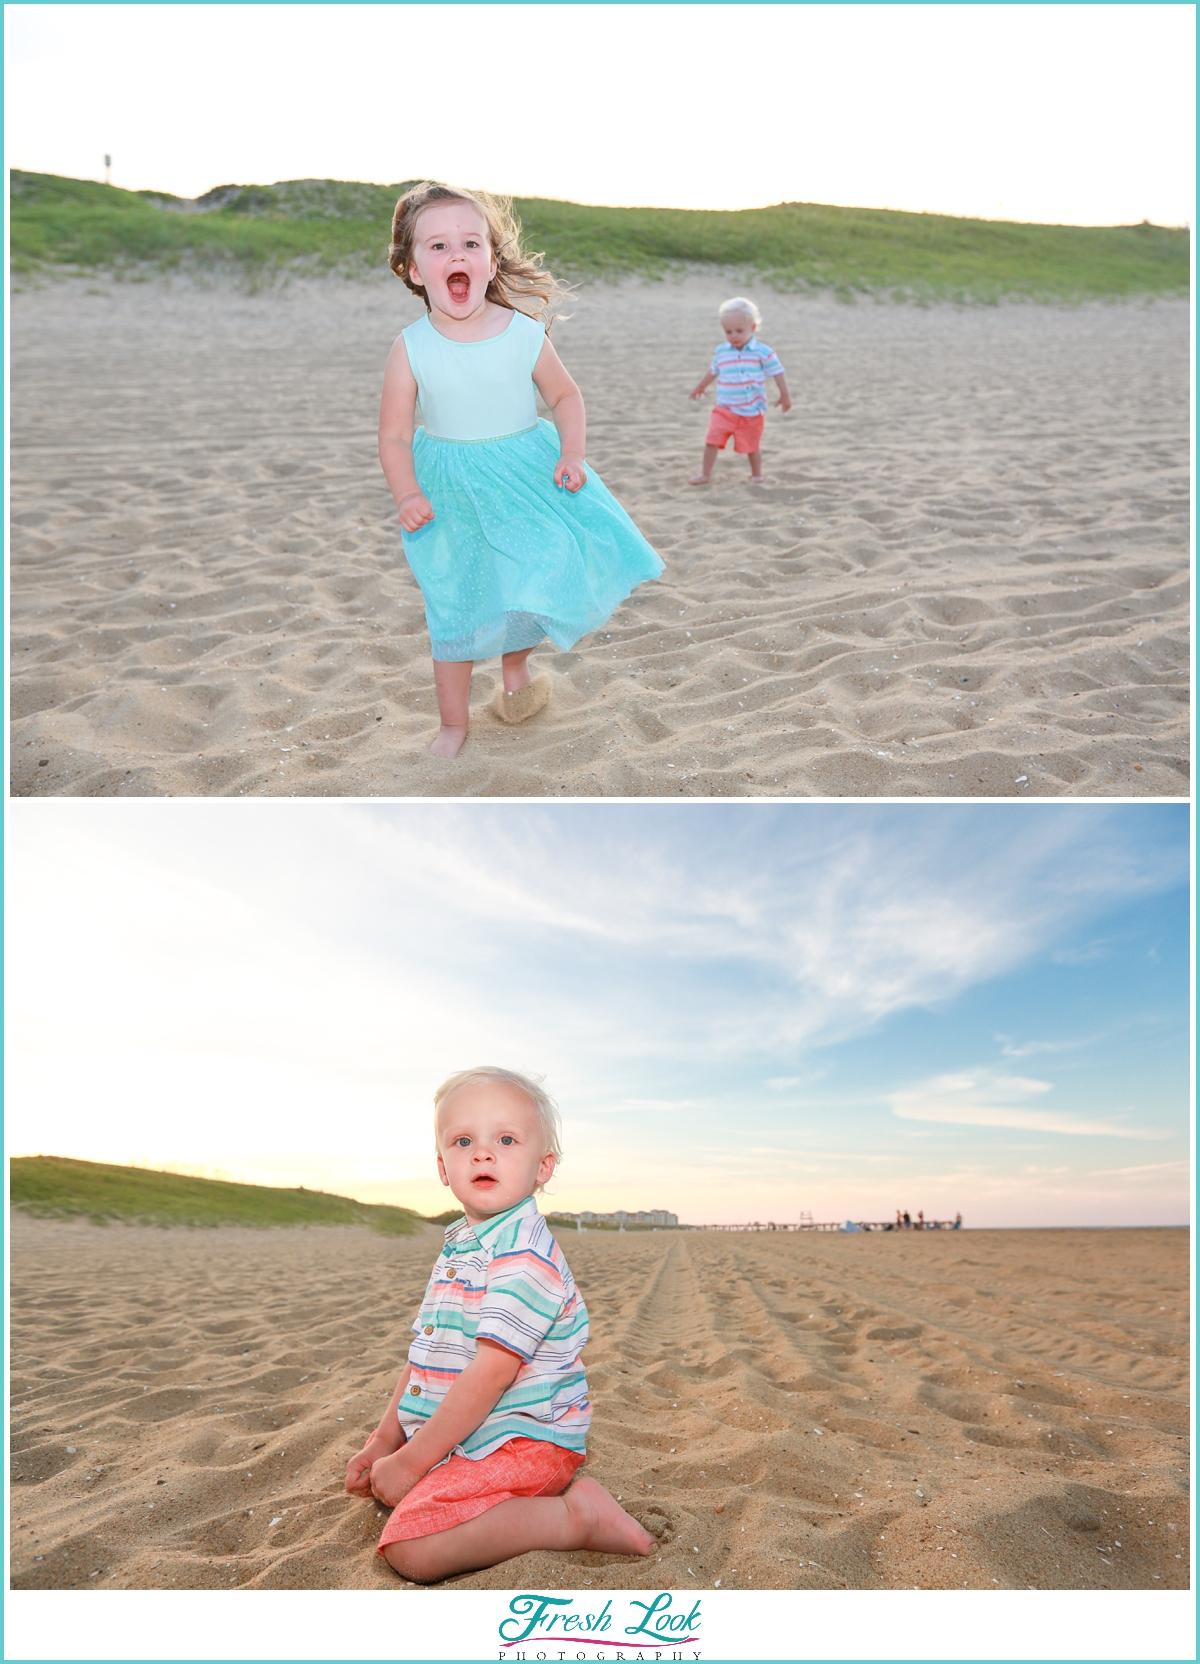 kids being kids beach photos